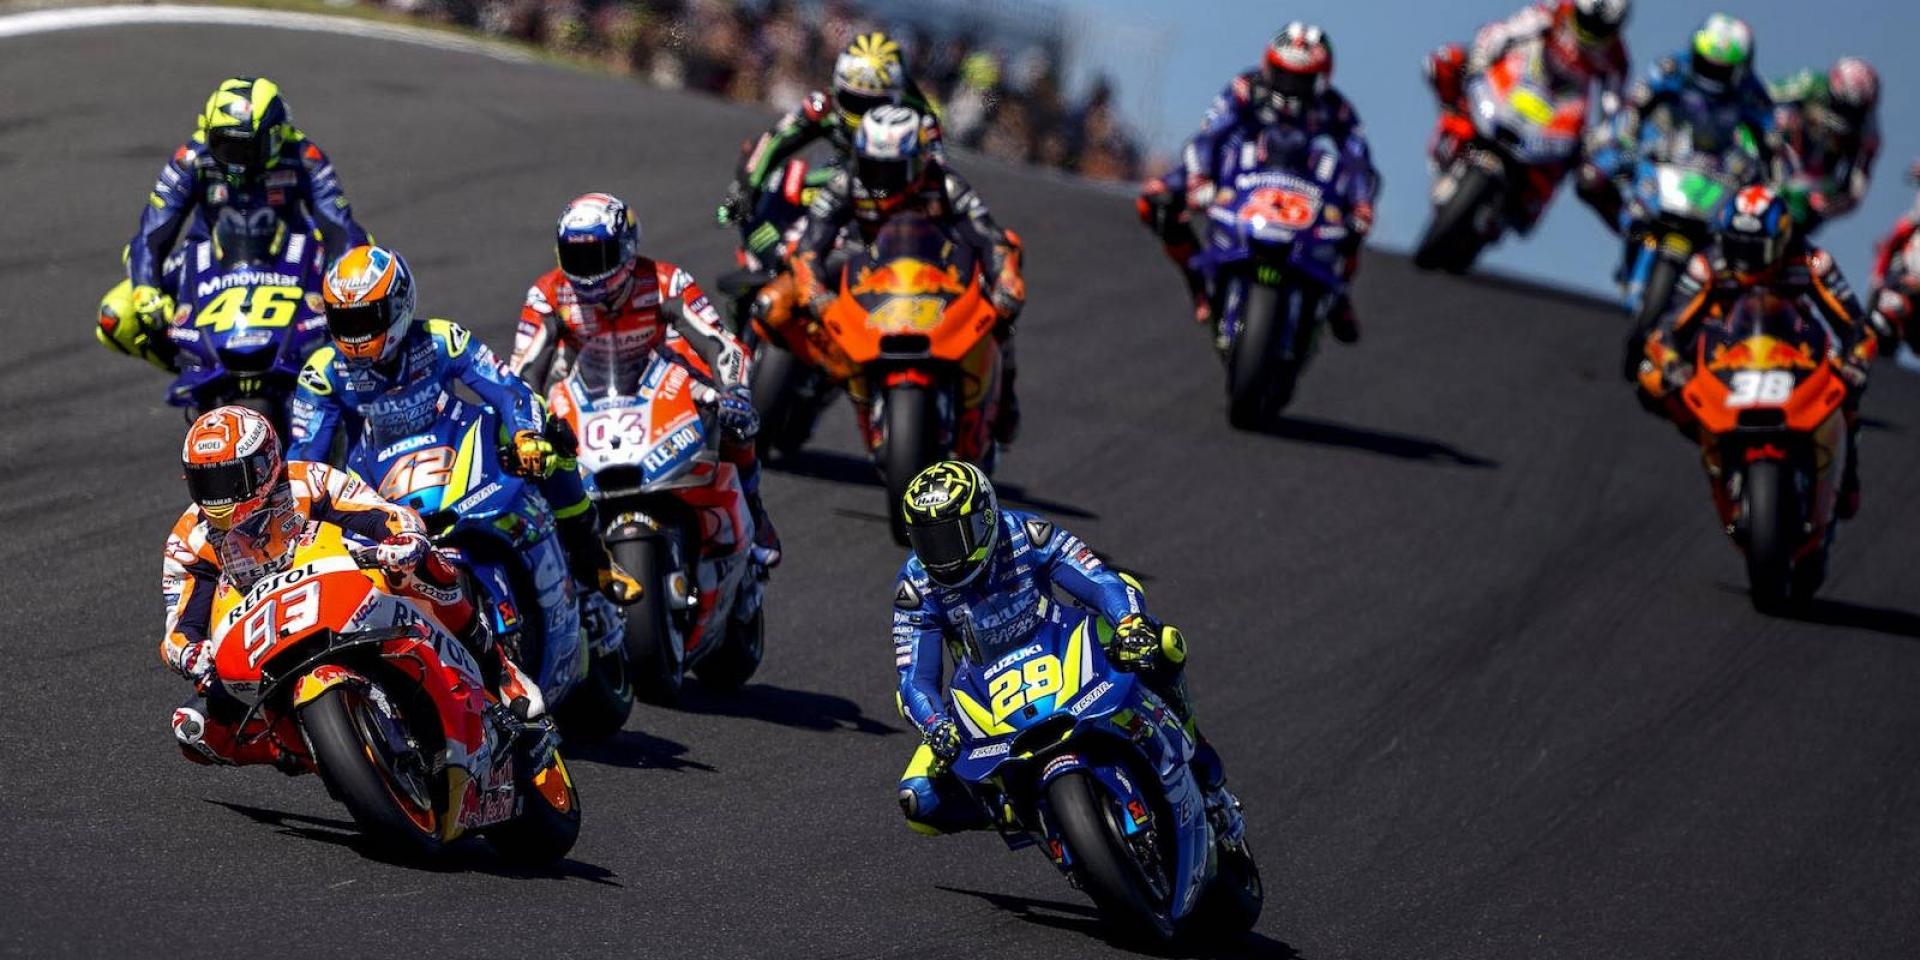 2021 MotoGP澳洲站再度取消,葡萄牙替補上陣!